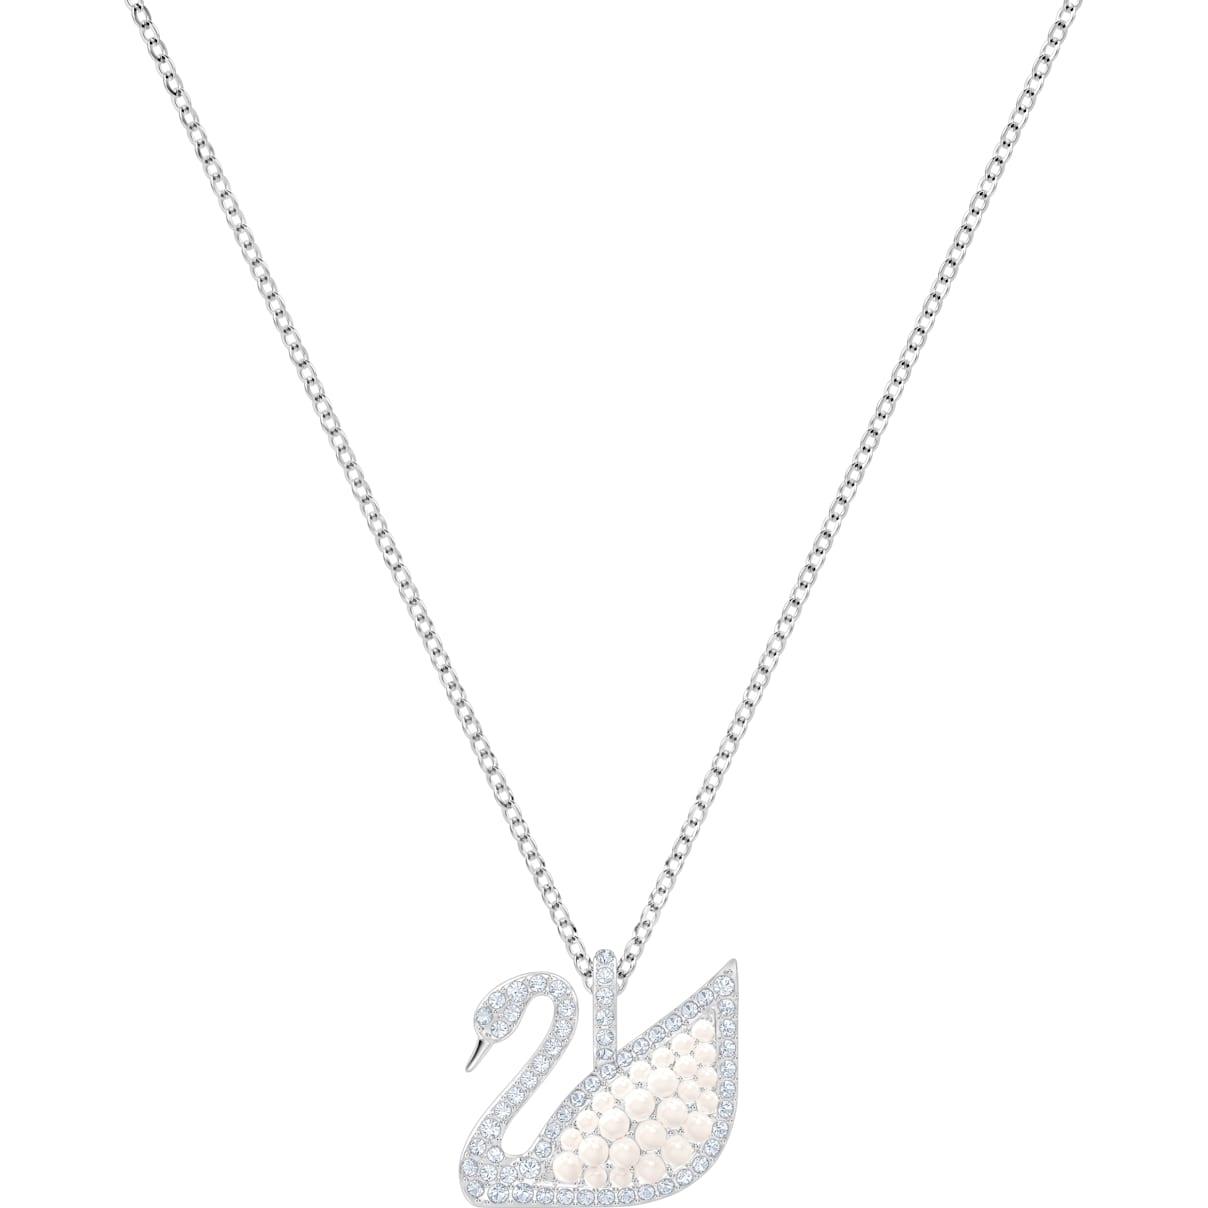 Swarovski Swarovski Iconic Swan Pendant, White, Rhodium plated